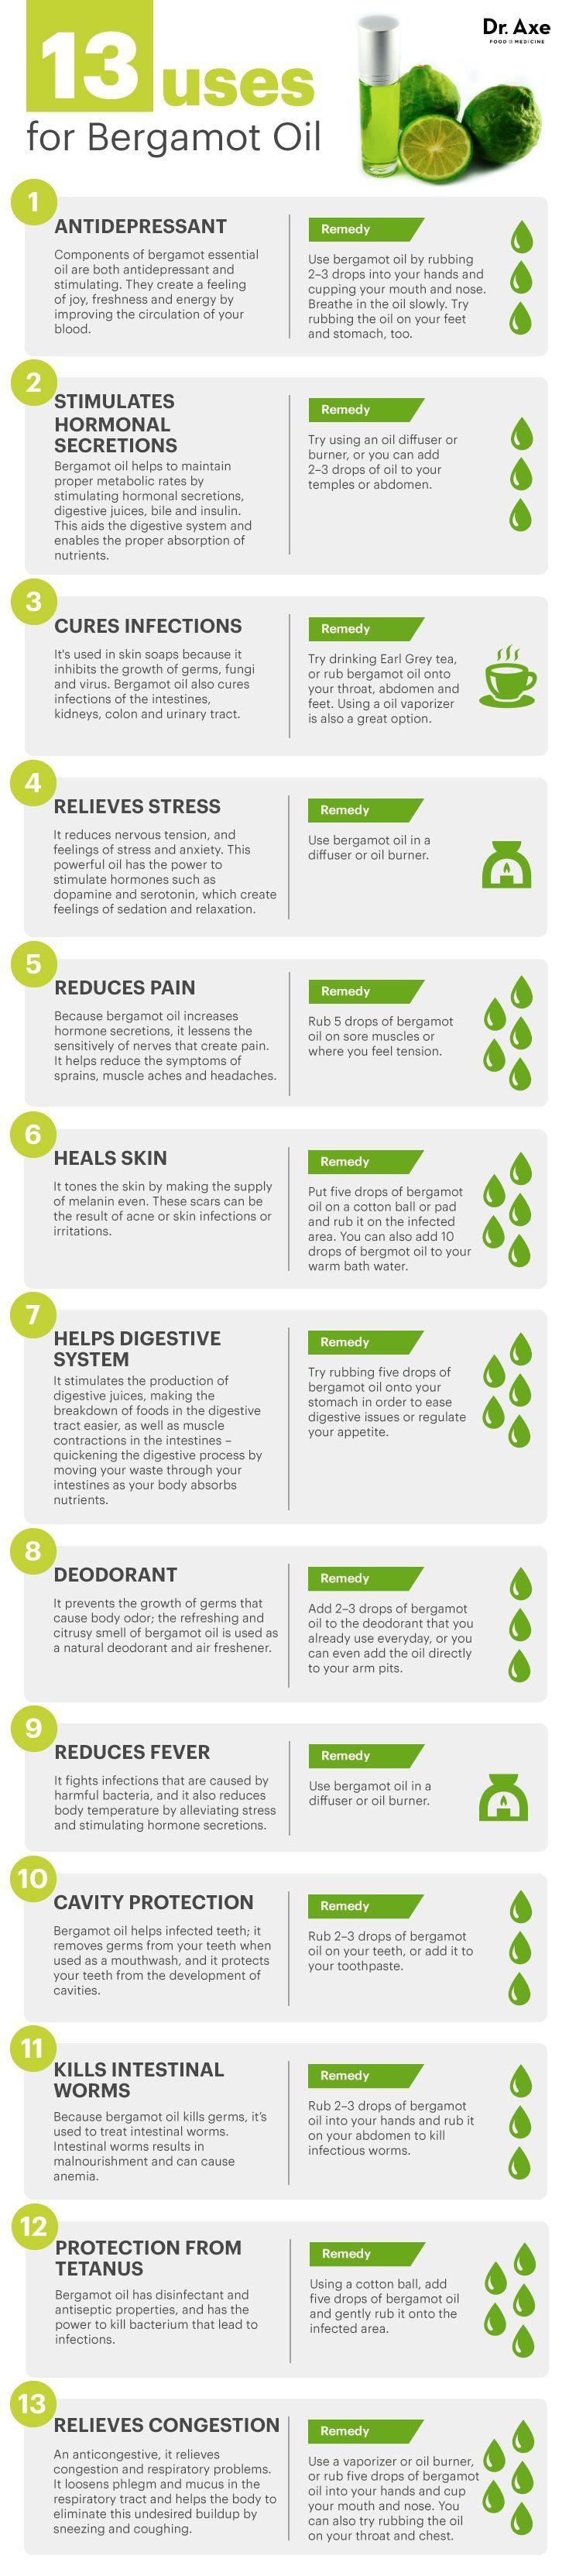 13 Bergamot Oil Uses  http://www.draxe.com #health #holistic #natural